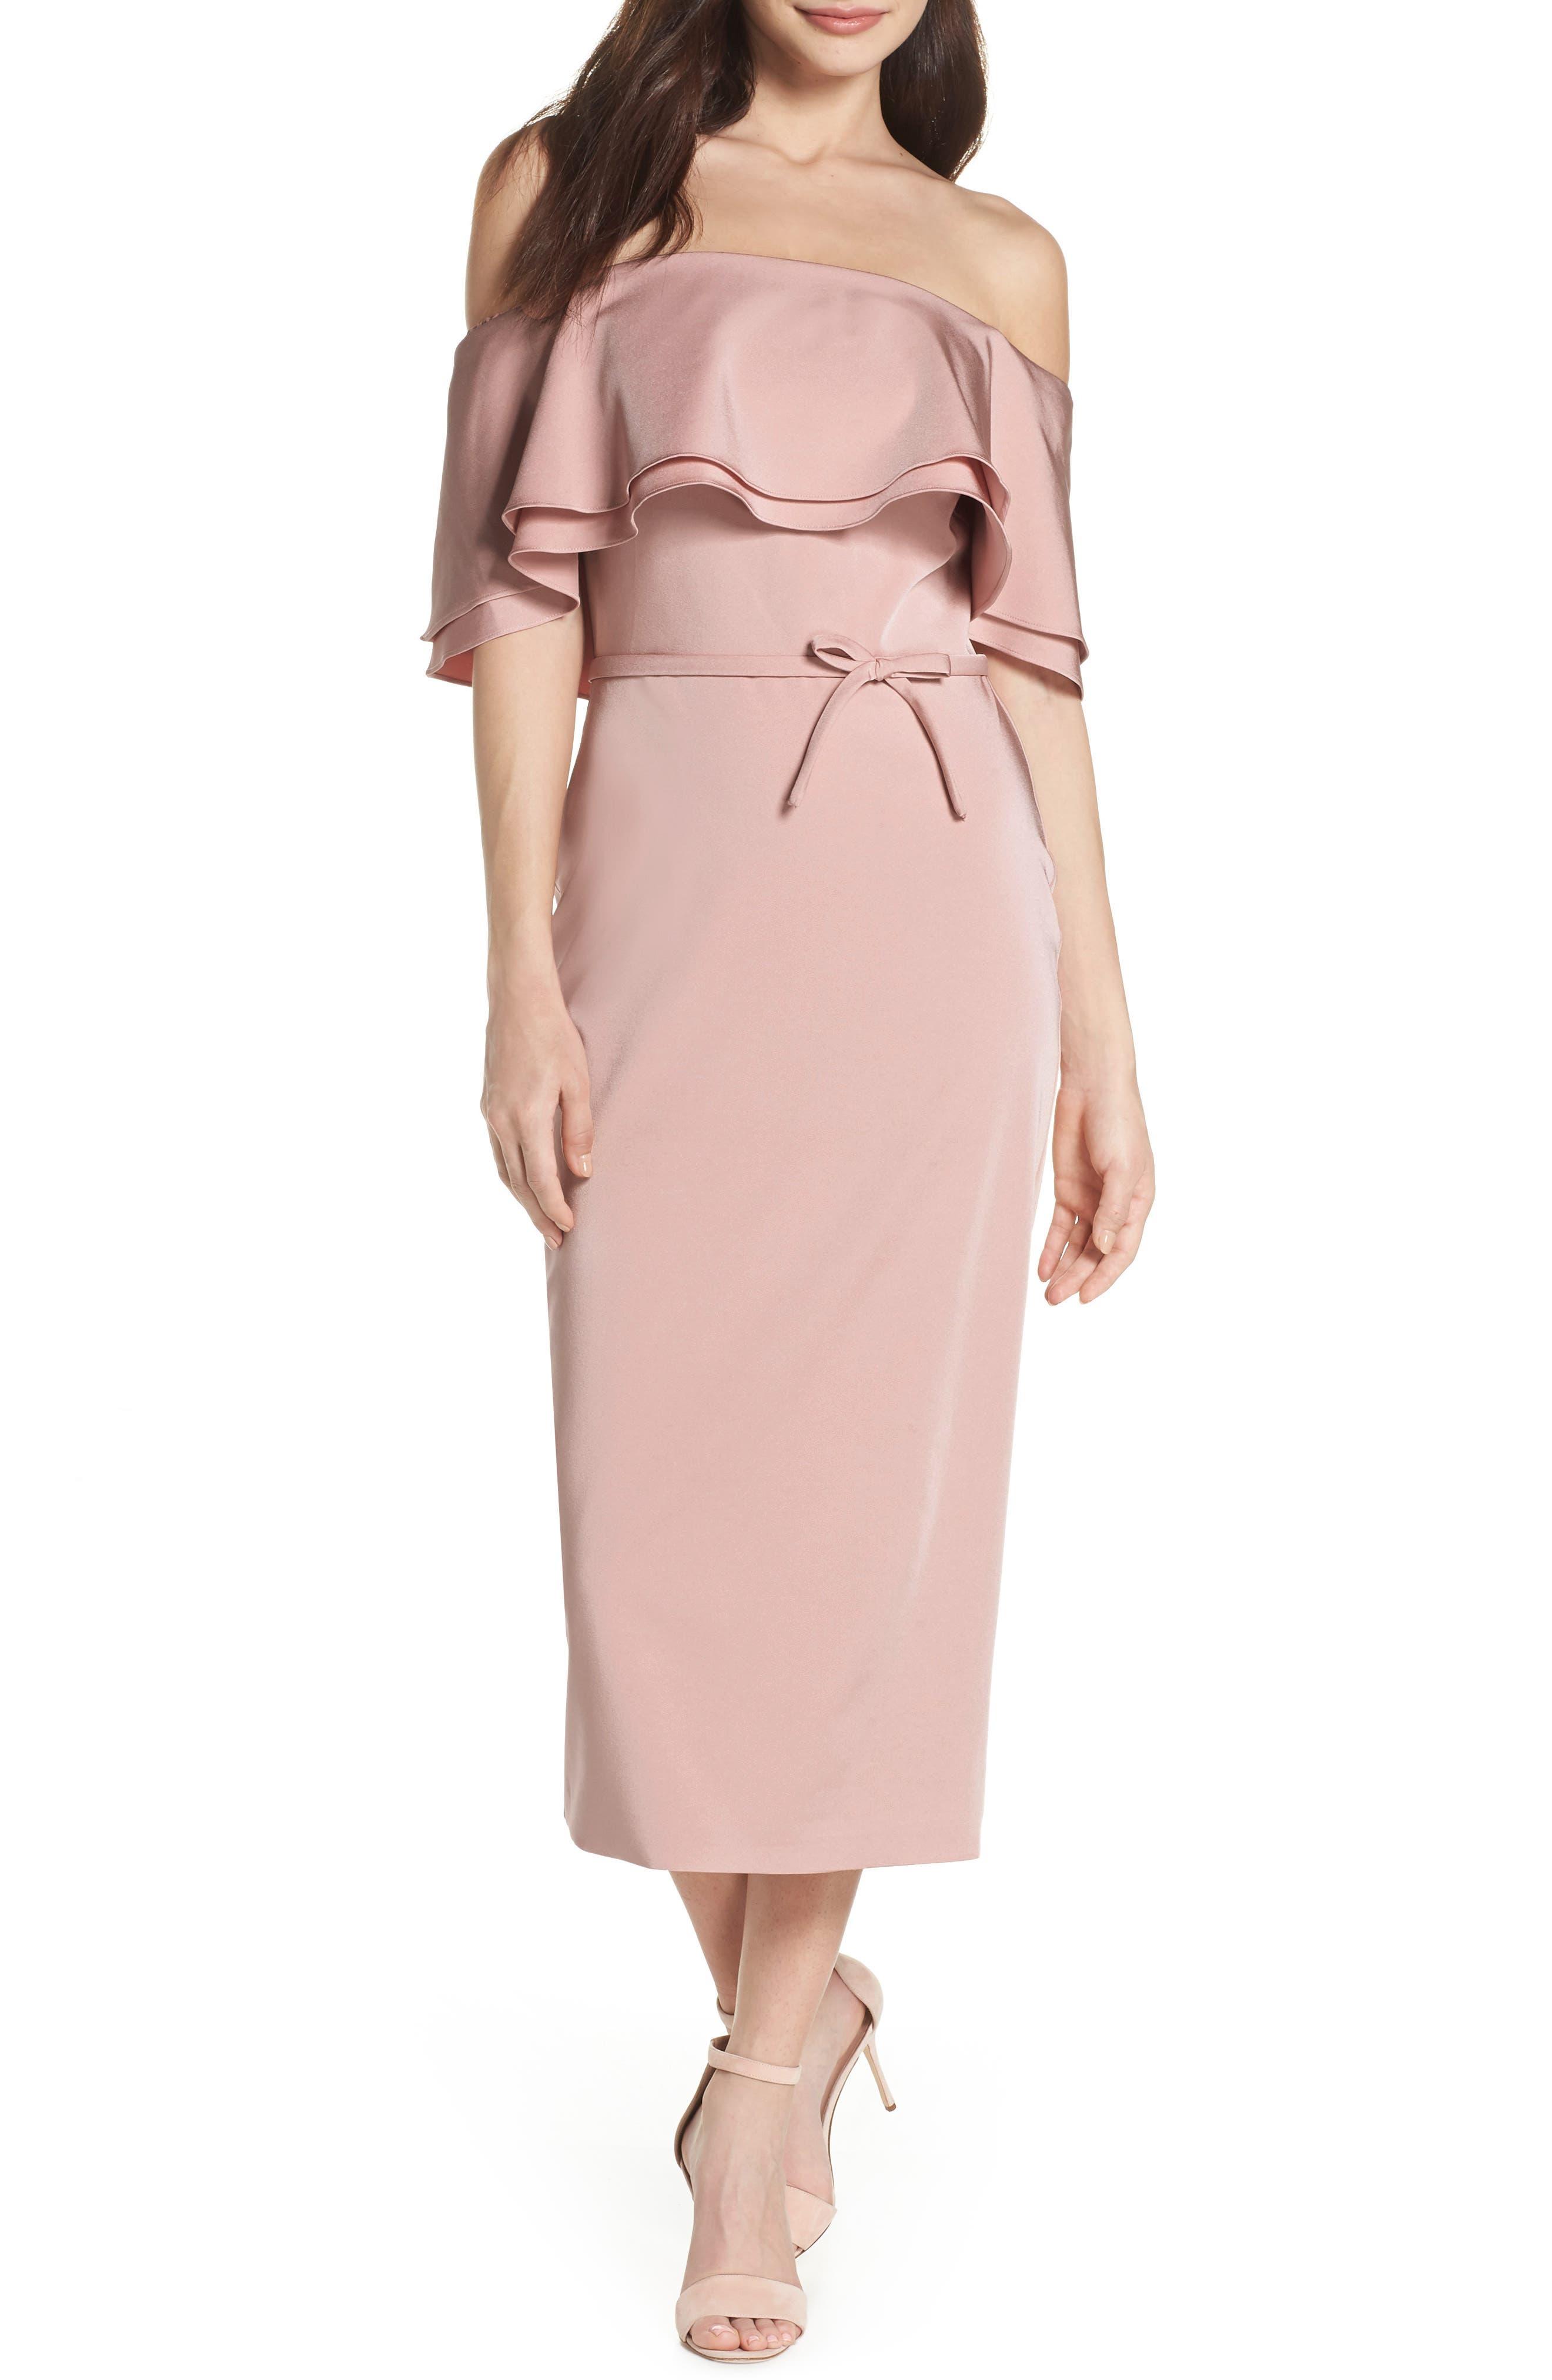 Ruffle Off the Shoulder Tea Length Dress,                             Main thumbnail 1, color,                             Rose